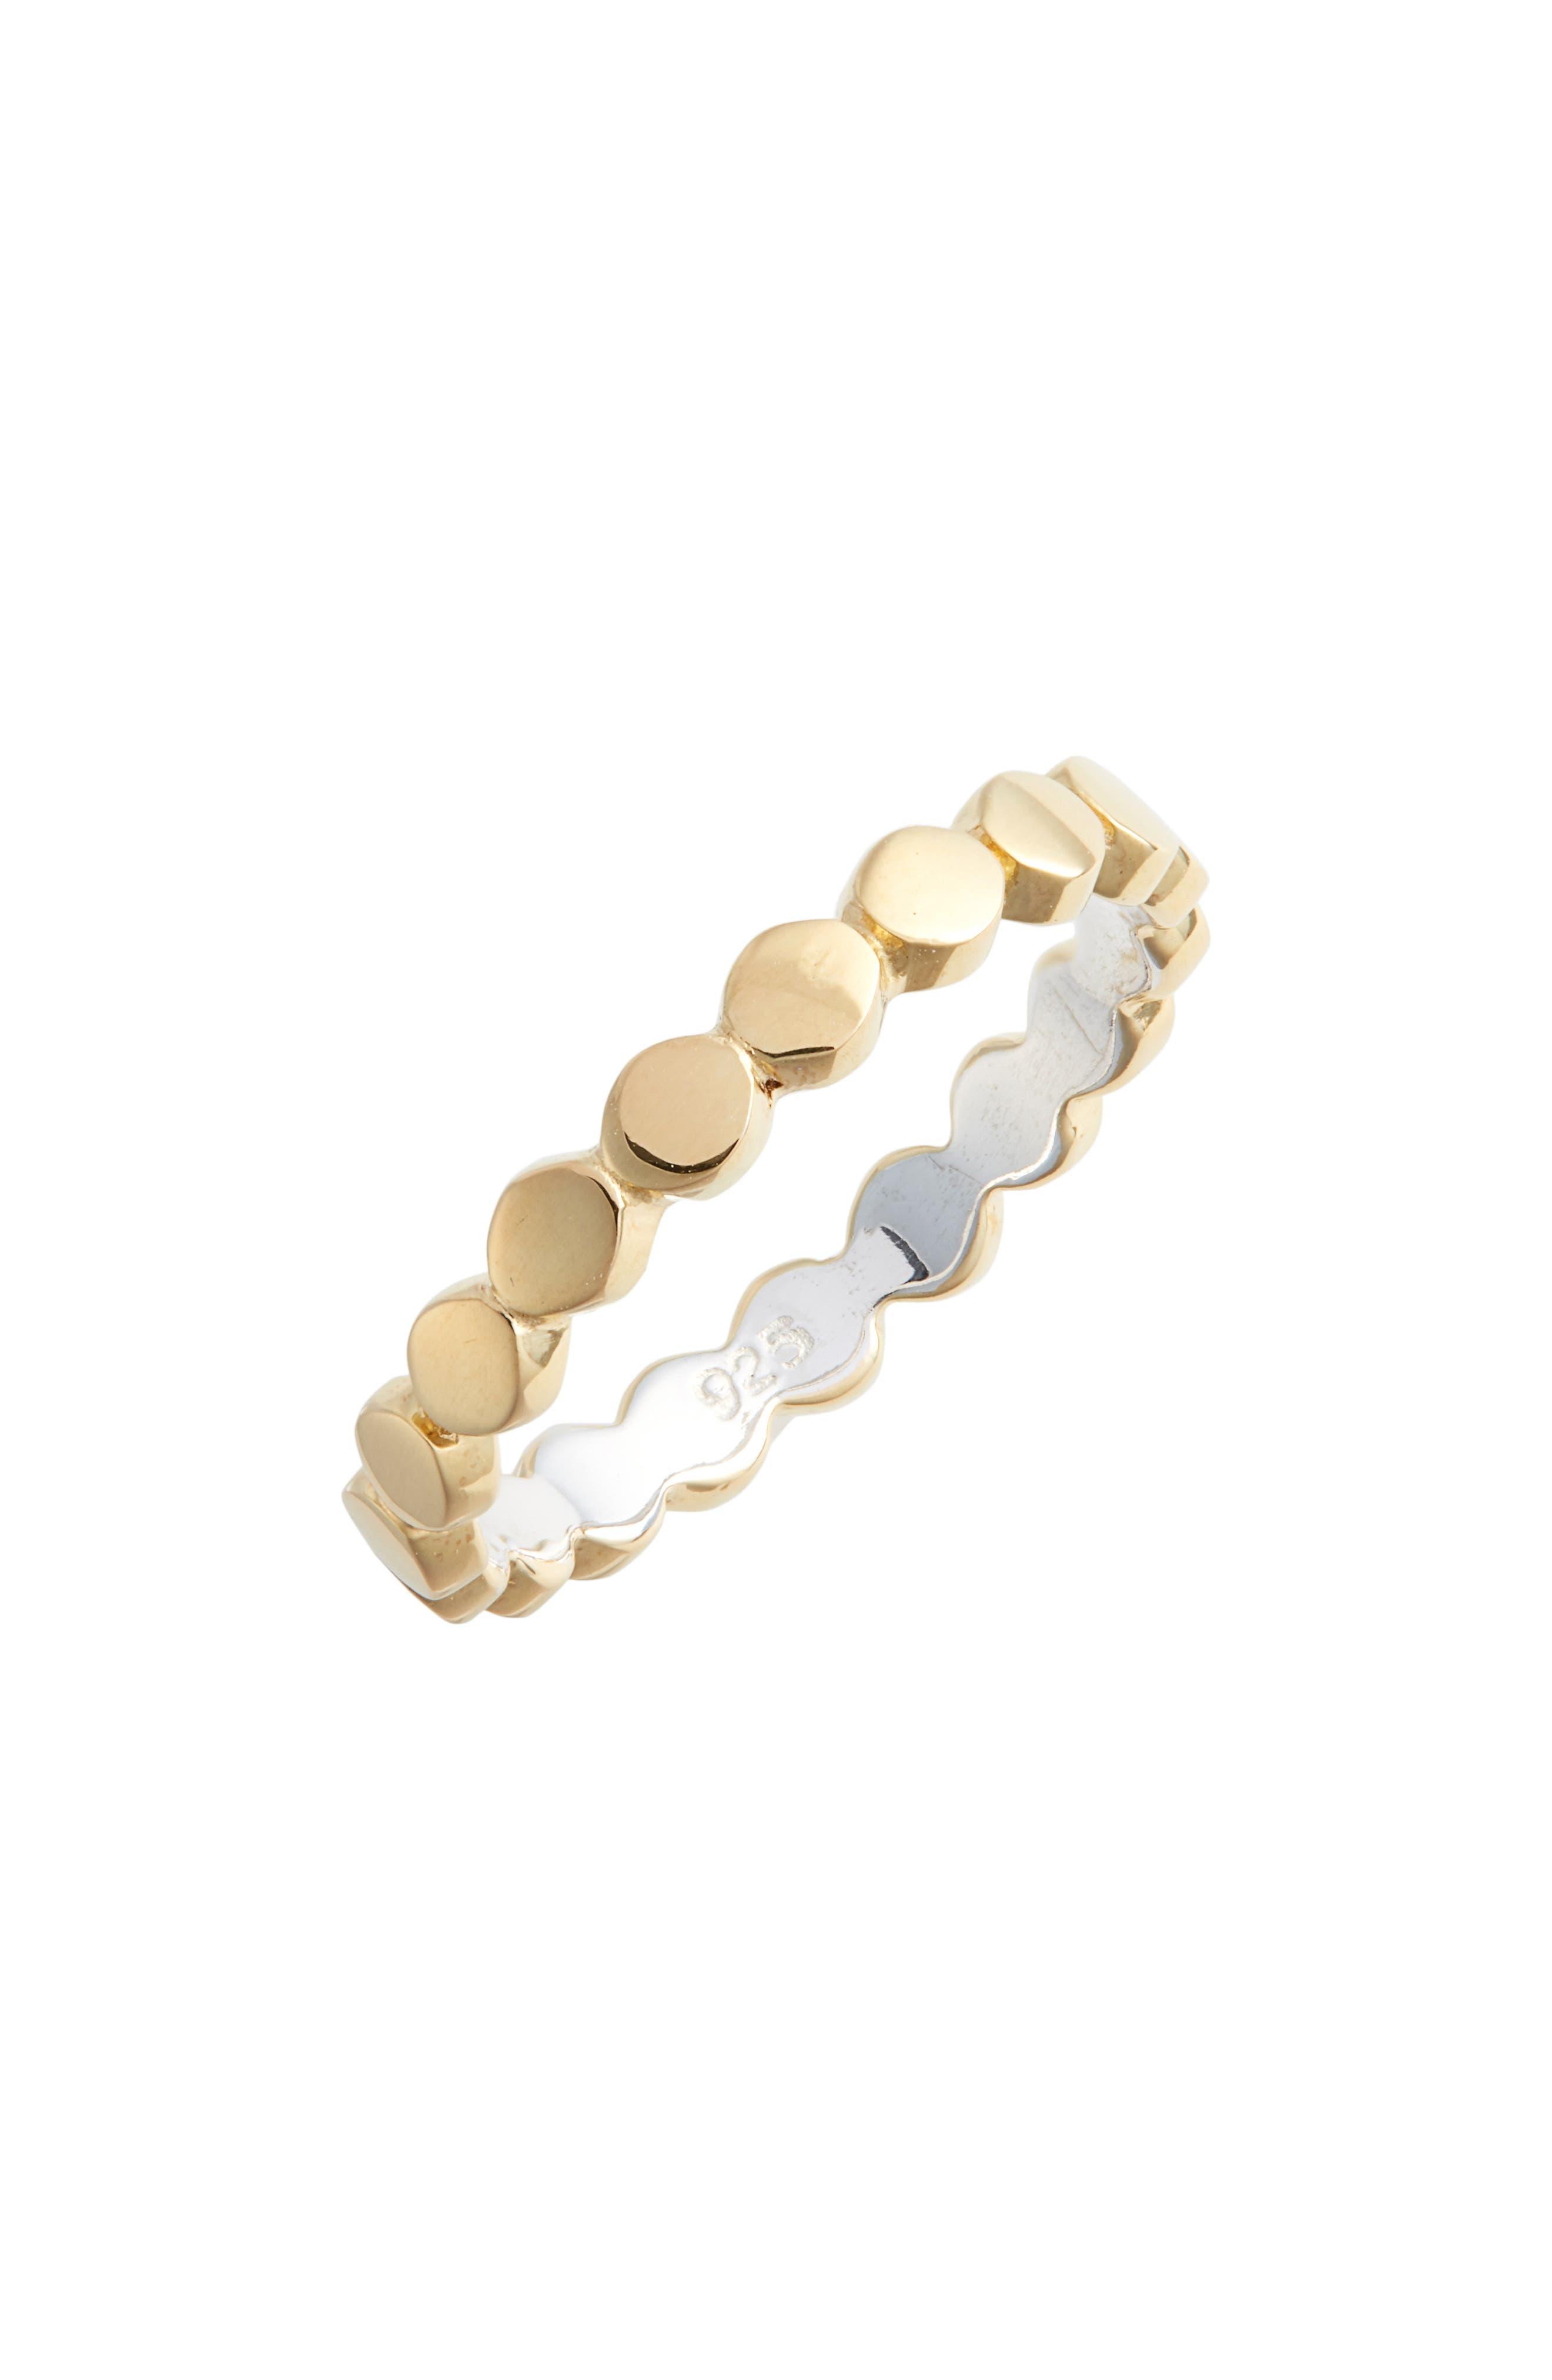 ANNA BECK Smooth Circle Stacking Ring in Gold